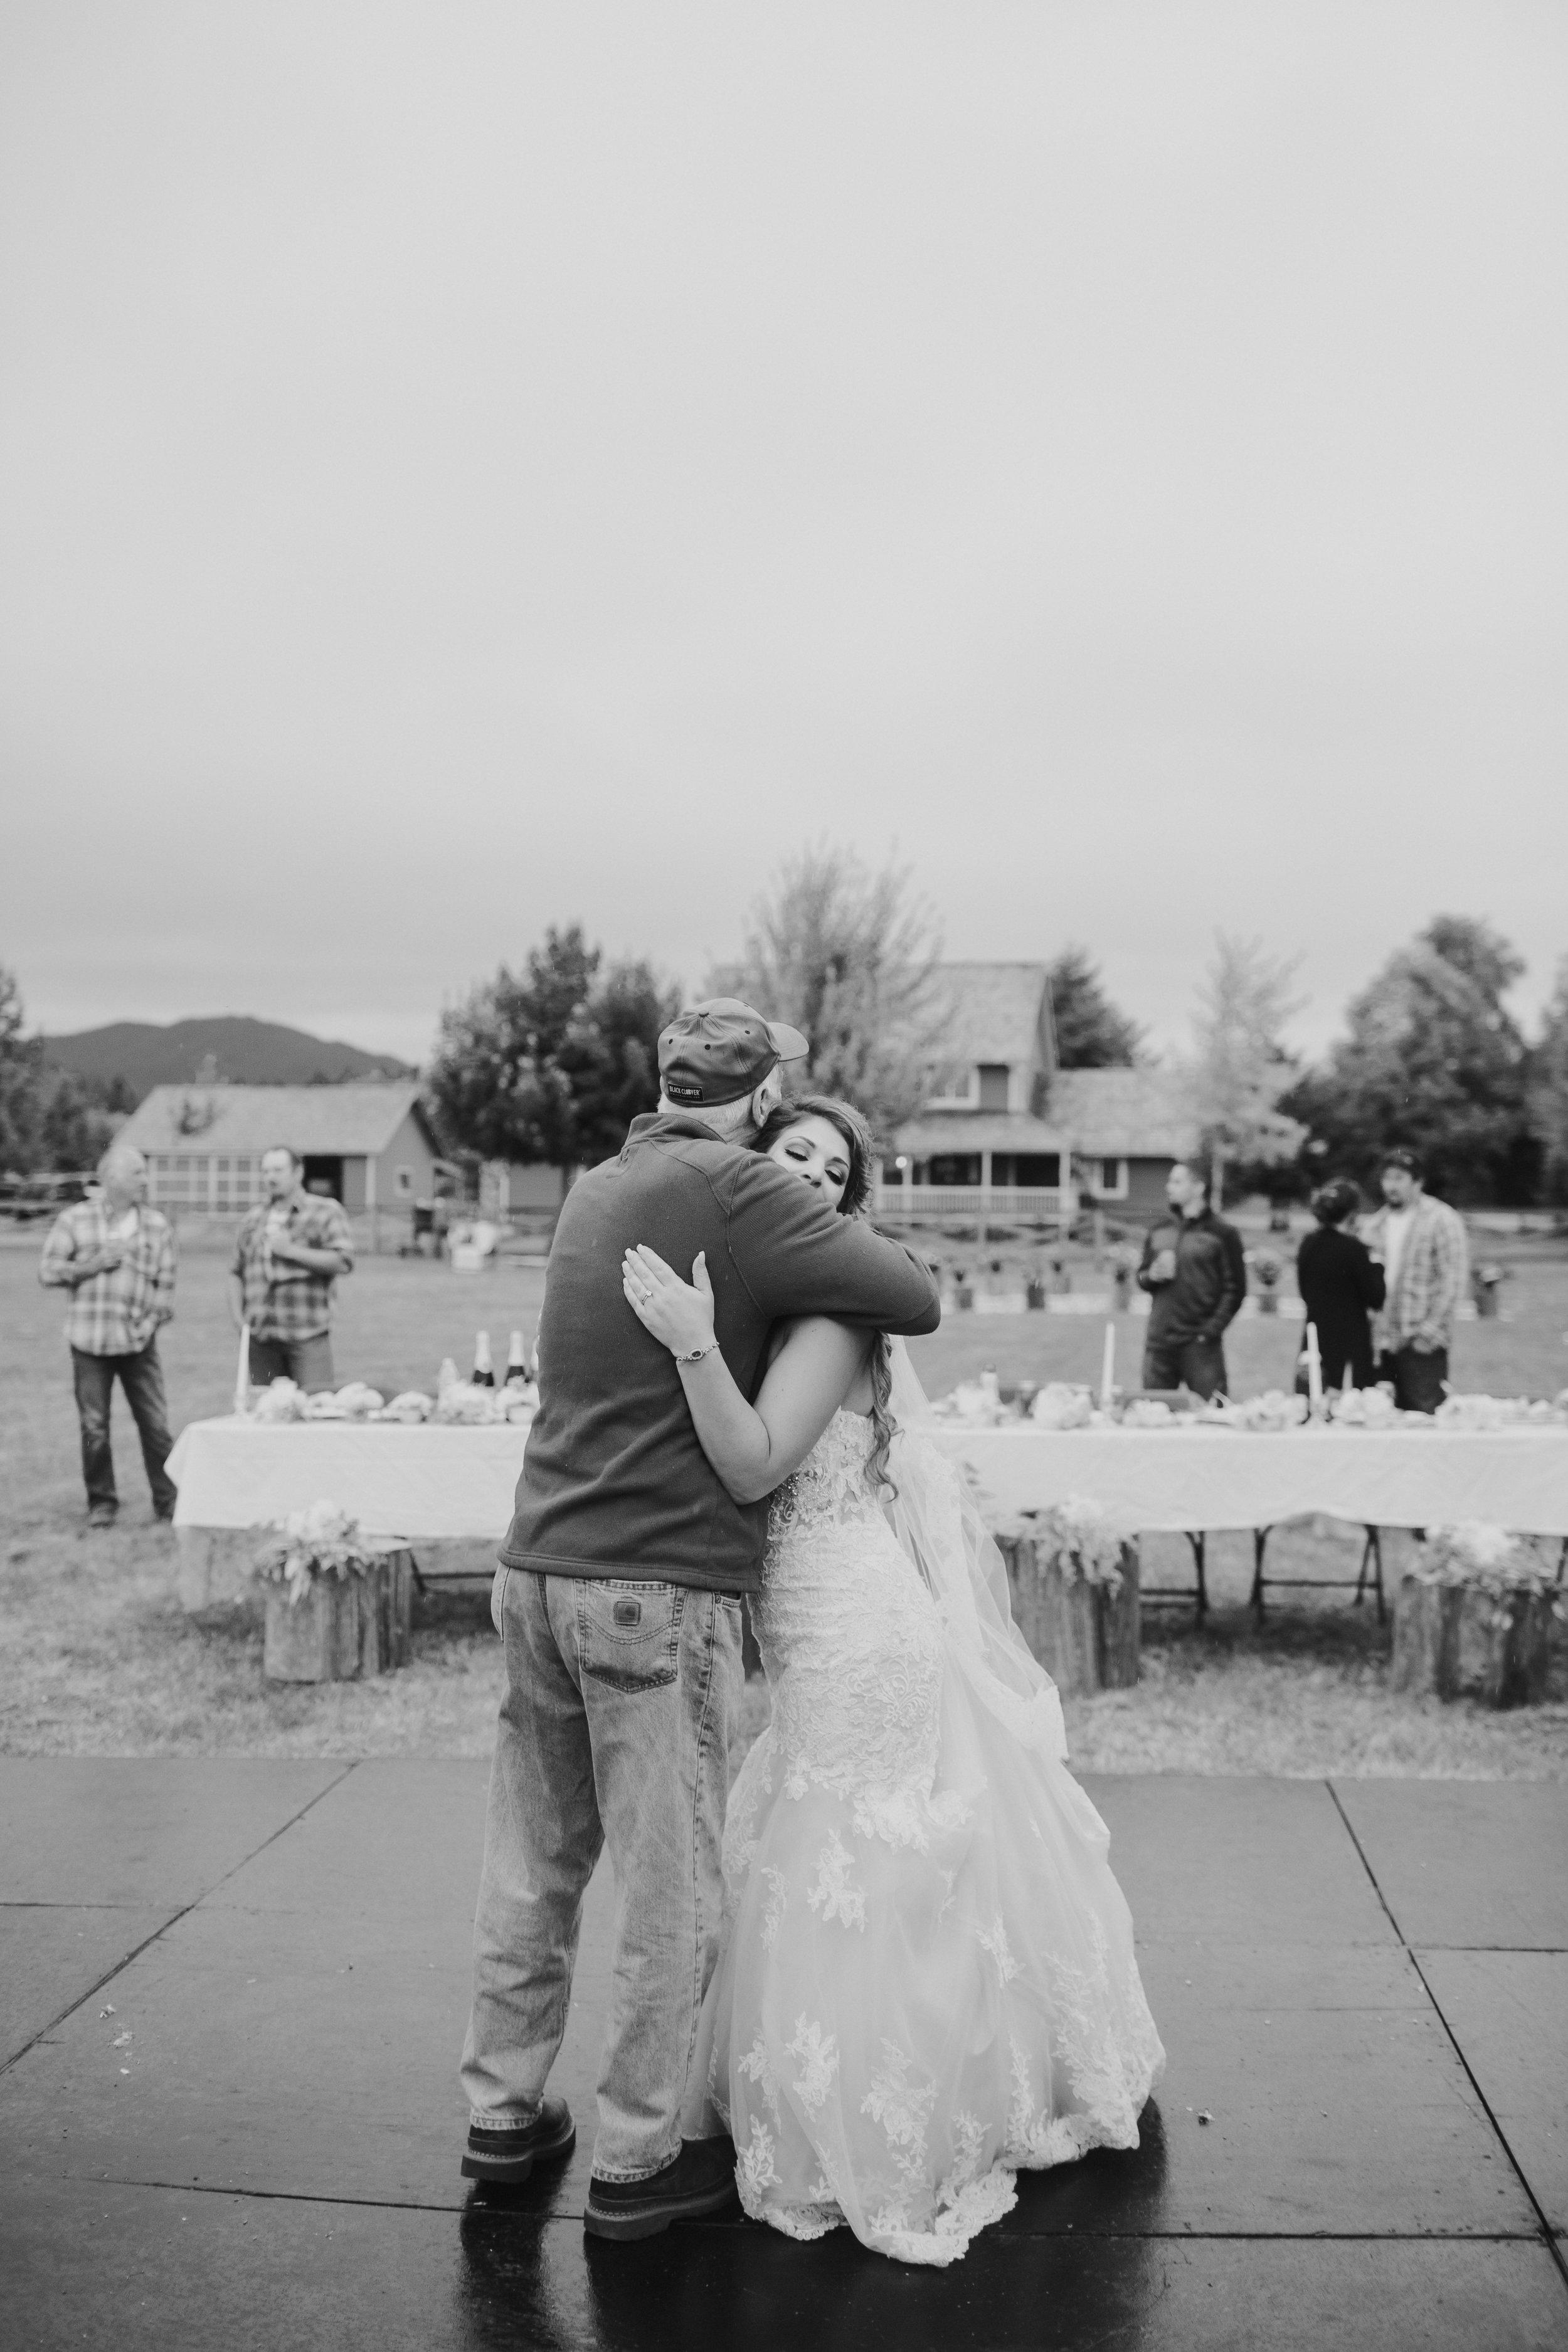 Olympic-Peninsula-Wedding-Photographer-PNW-Forks-Port-Angeles-Kayla-Dawn-Photography-engagement-Olympic-National-Park-188.jpg